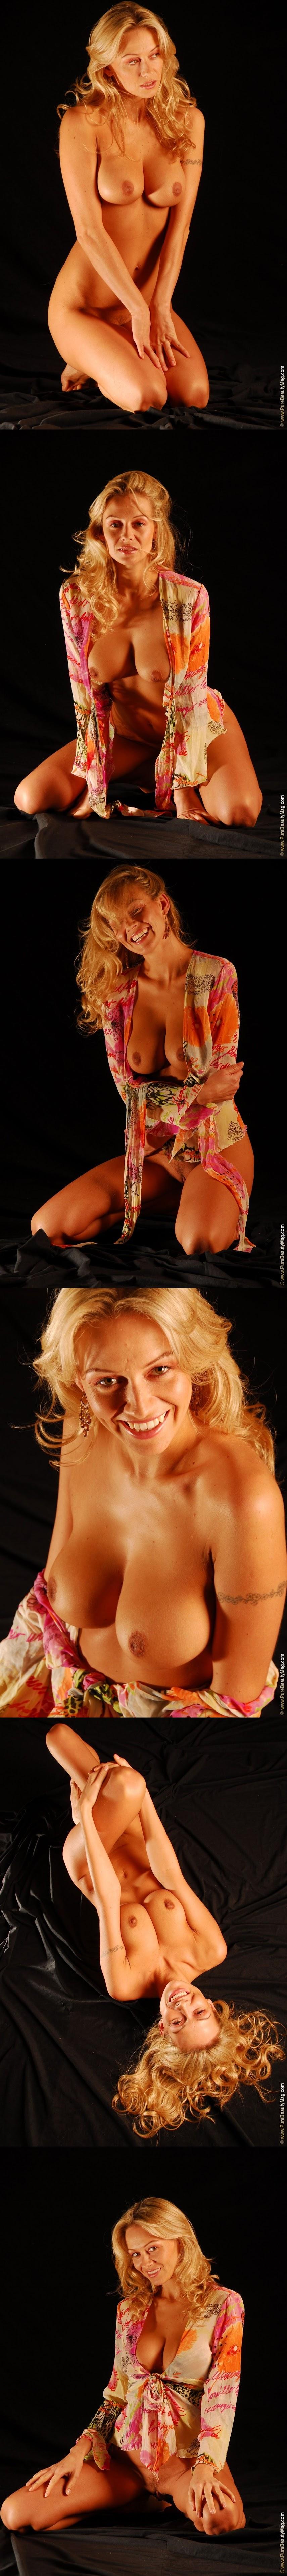 PureBeautyMag PBM  - 2007-02-15 - #s325190 - Melinda M - Hottie - 3008px